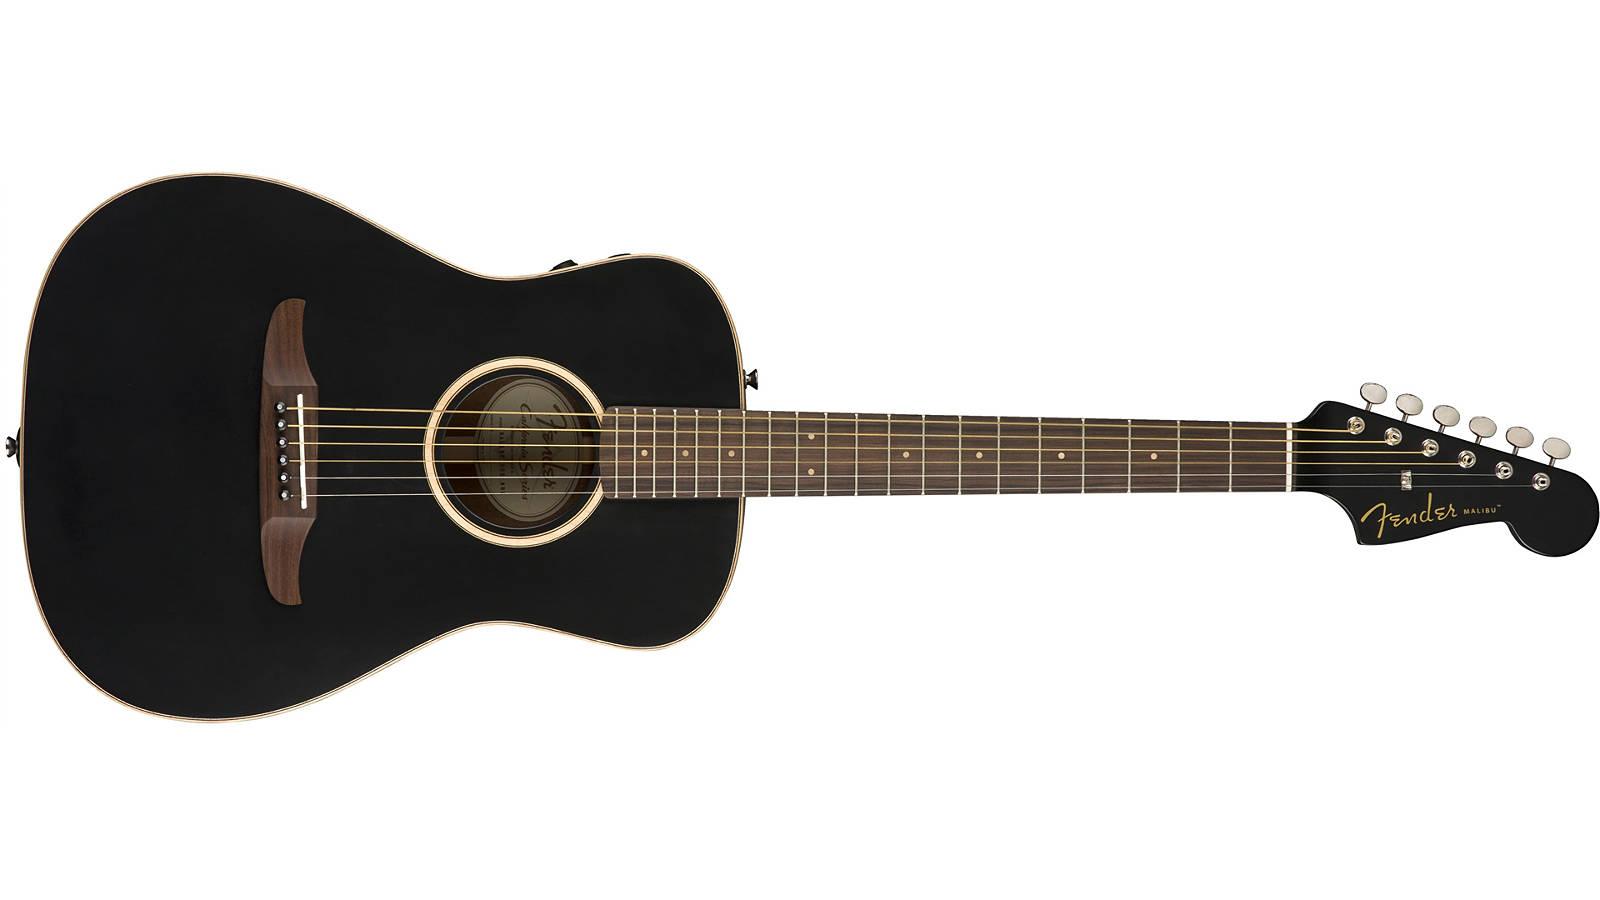 Fender Malibu Special Matte Black